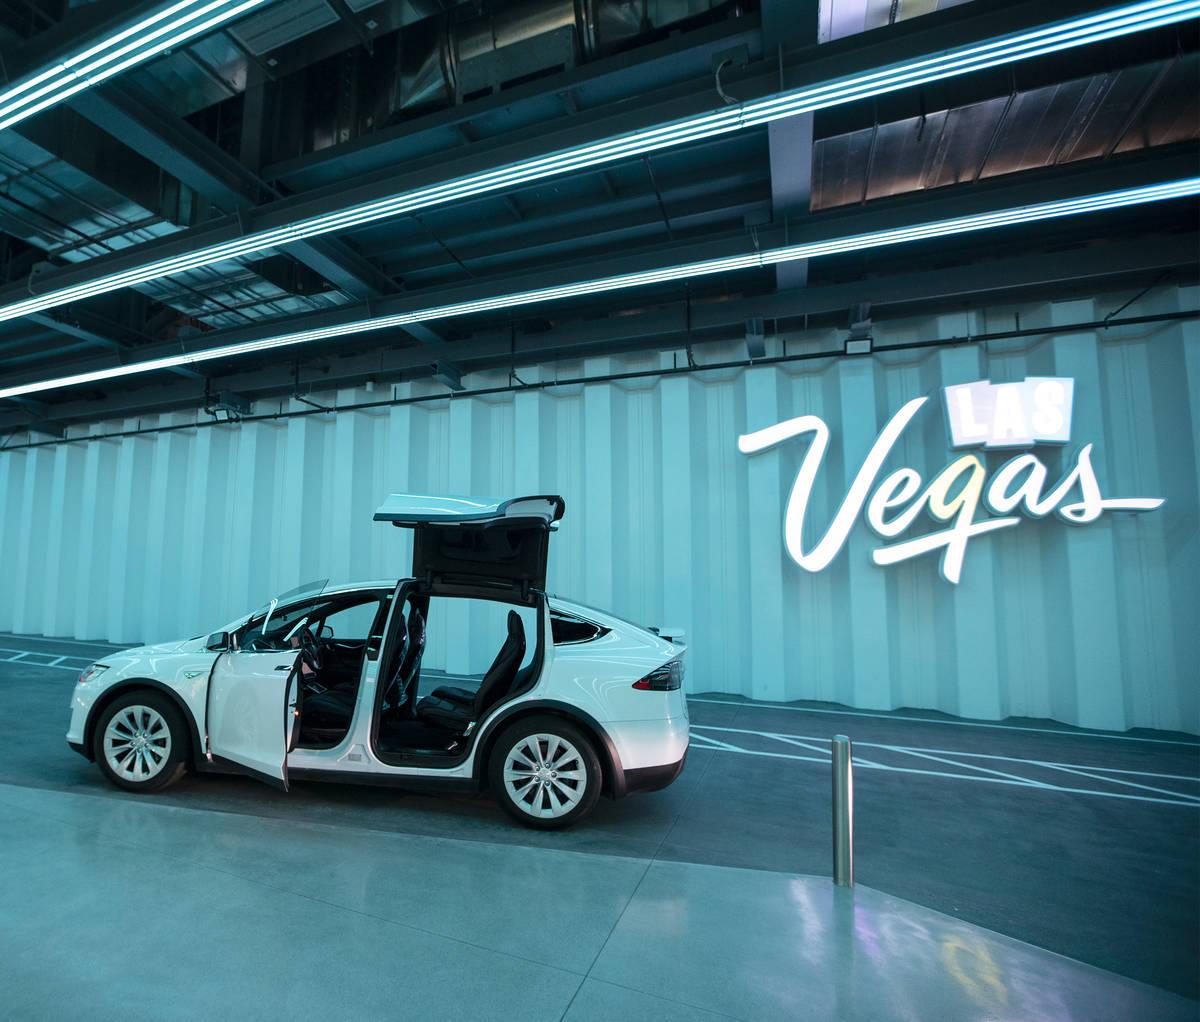 La Central Station del Boring Company's Convention Center Loop durante un tour en Las Vegas C ...